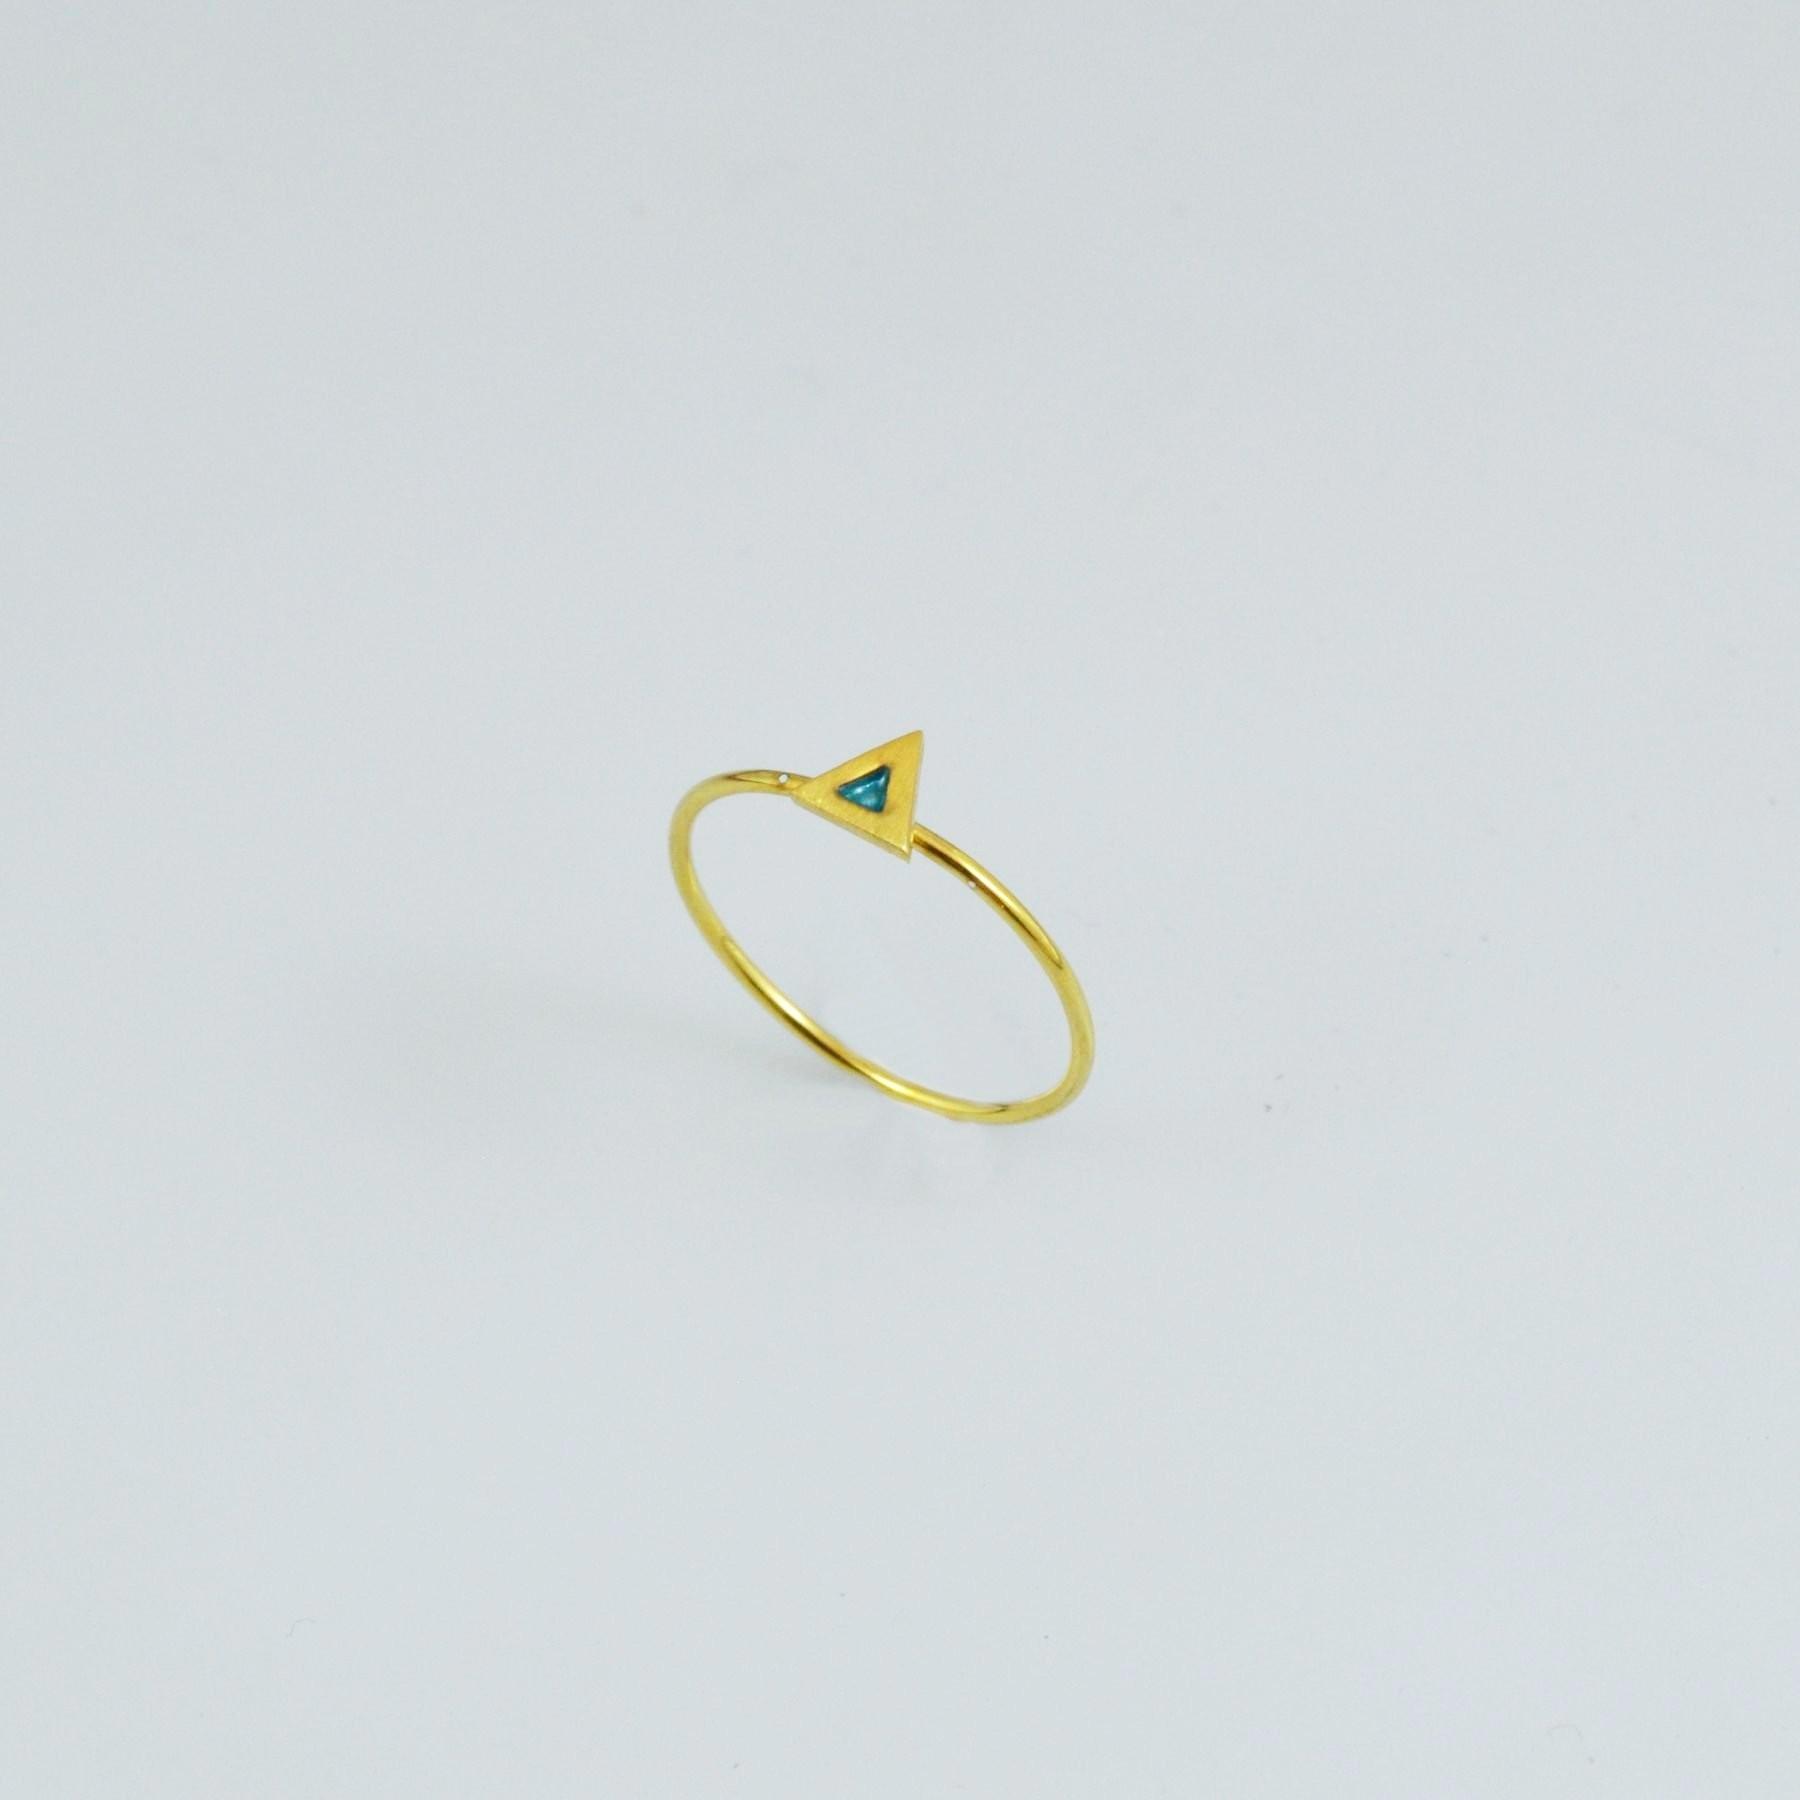 Handmade gold ring 14K with enamel